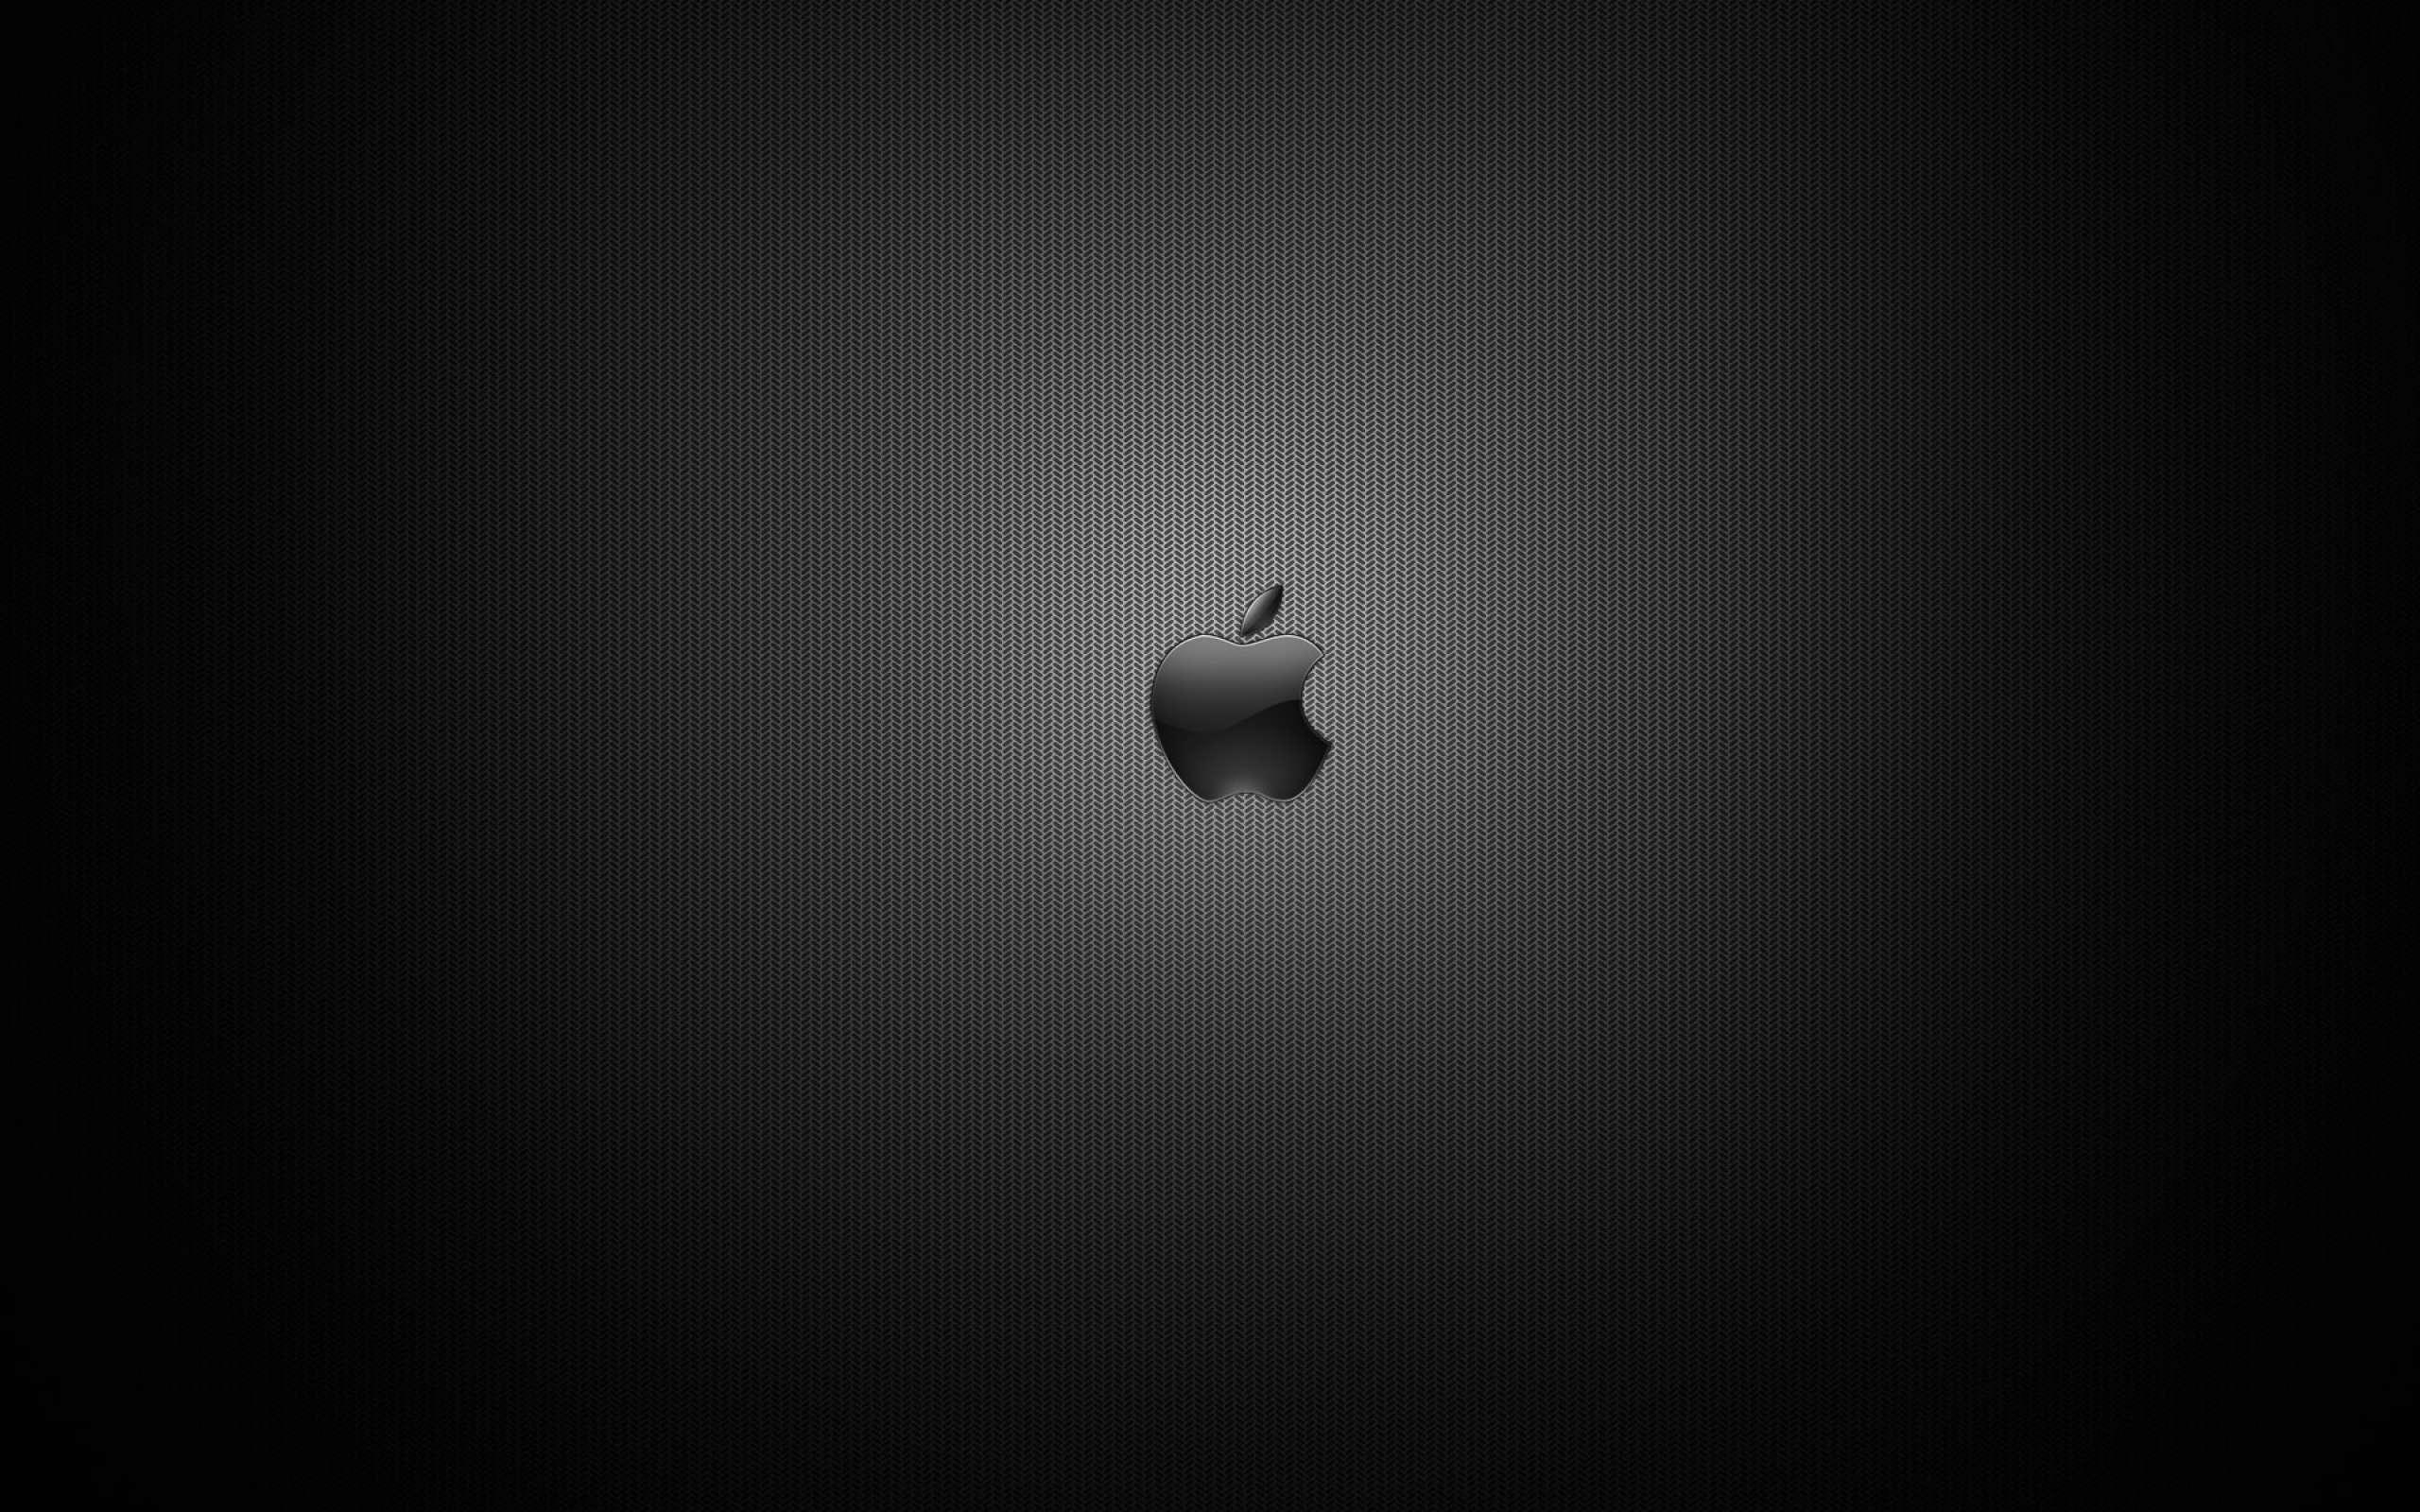 Free Download Apple 4k Ultra Hd Wallpapers Top Apple 4k Ultra Hd 2560x1600 For Your Desktop Mobile Tablet Explore 68 Desktop Backgrounds Apple Mac Wallpaper Hd Mac Wallpapers Desktop